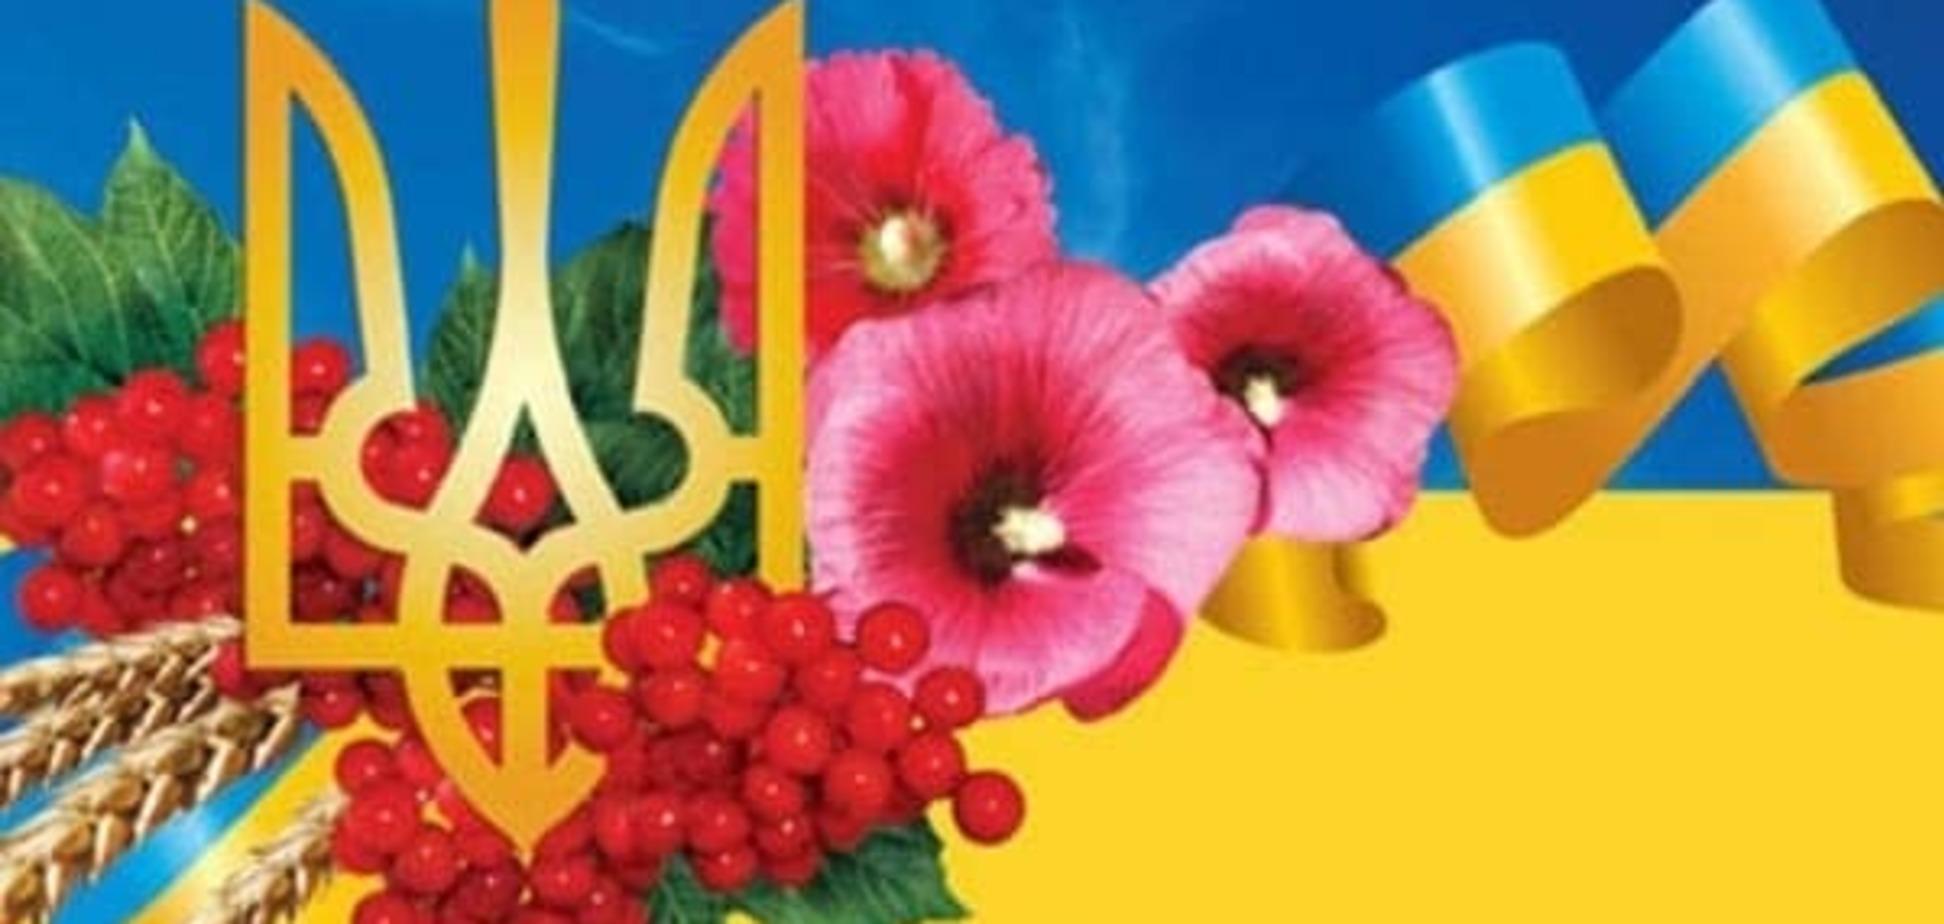 З Днем Незалежності, Україно!